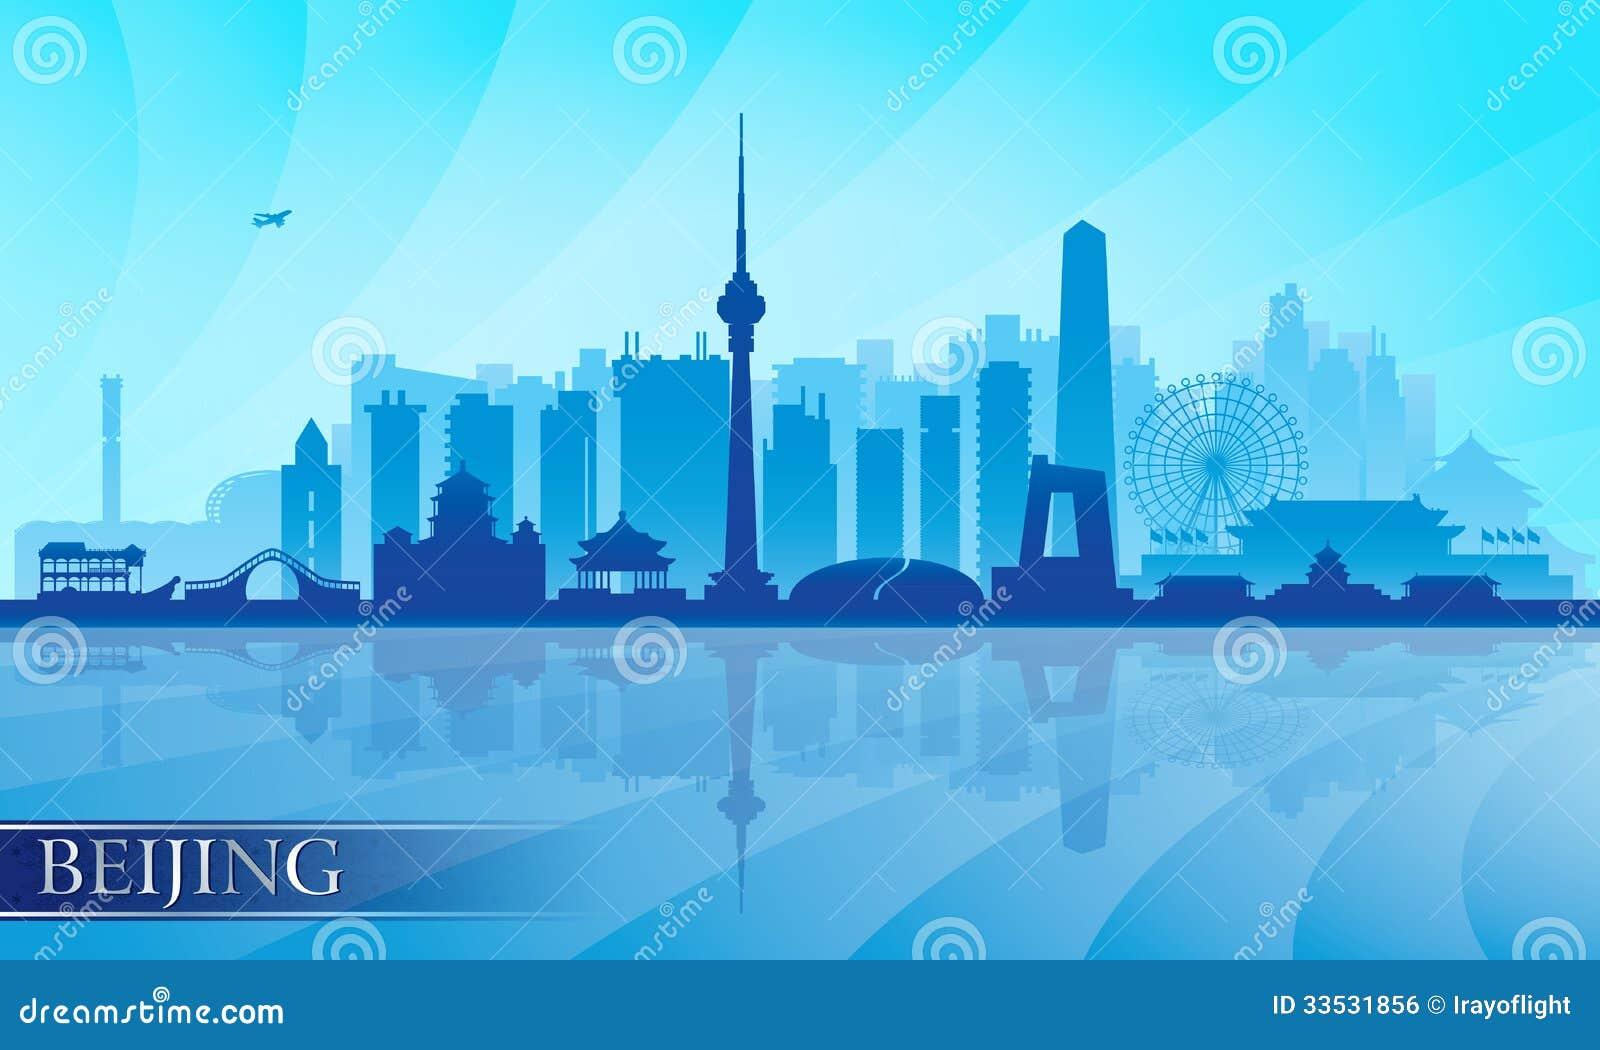 Beijing City Skyline Detailed Silhouette Royalty Free Stock Image ...